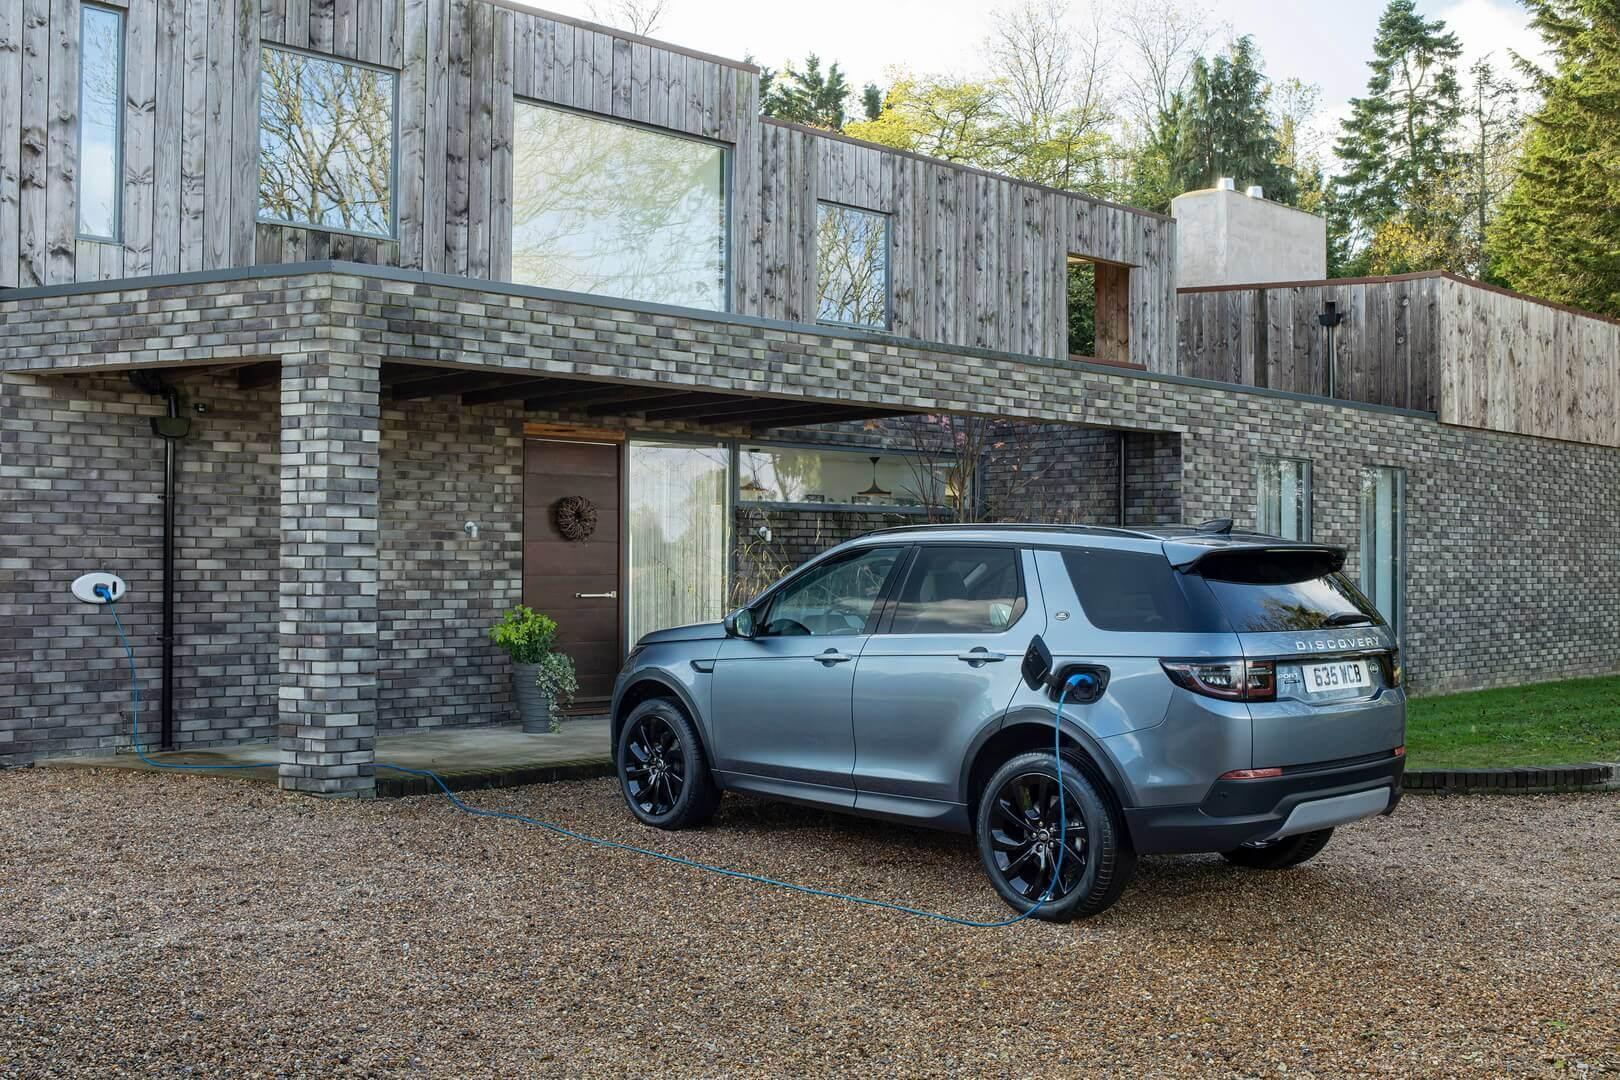 Land Rover Discovery Sport представлен в плагин-гибридной версии с электрическим запасом хода до 62 км